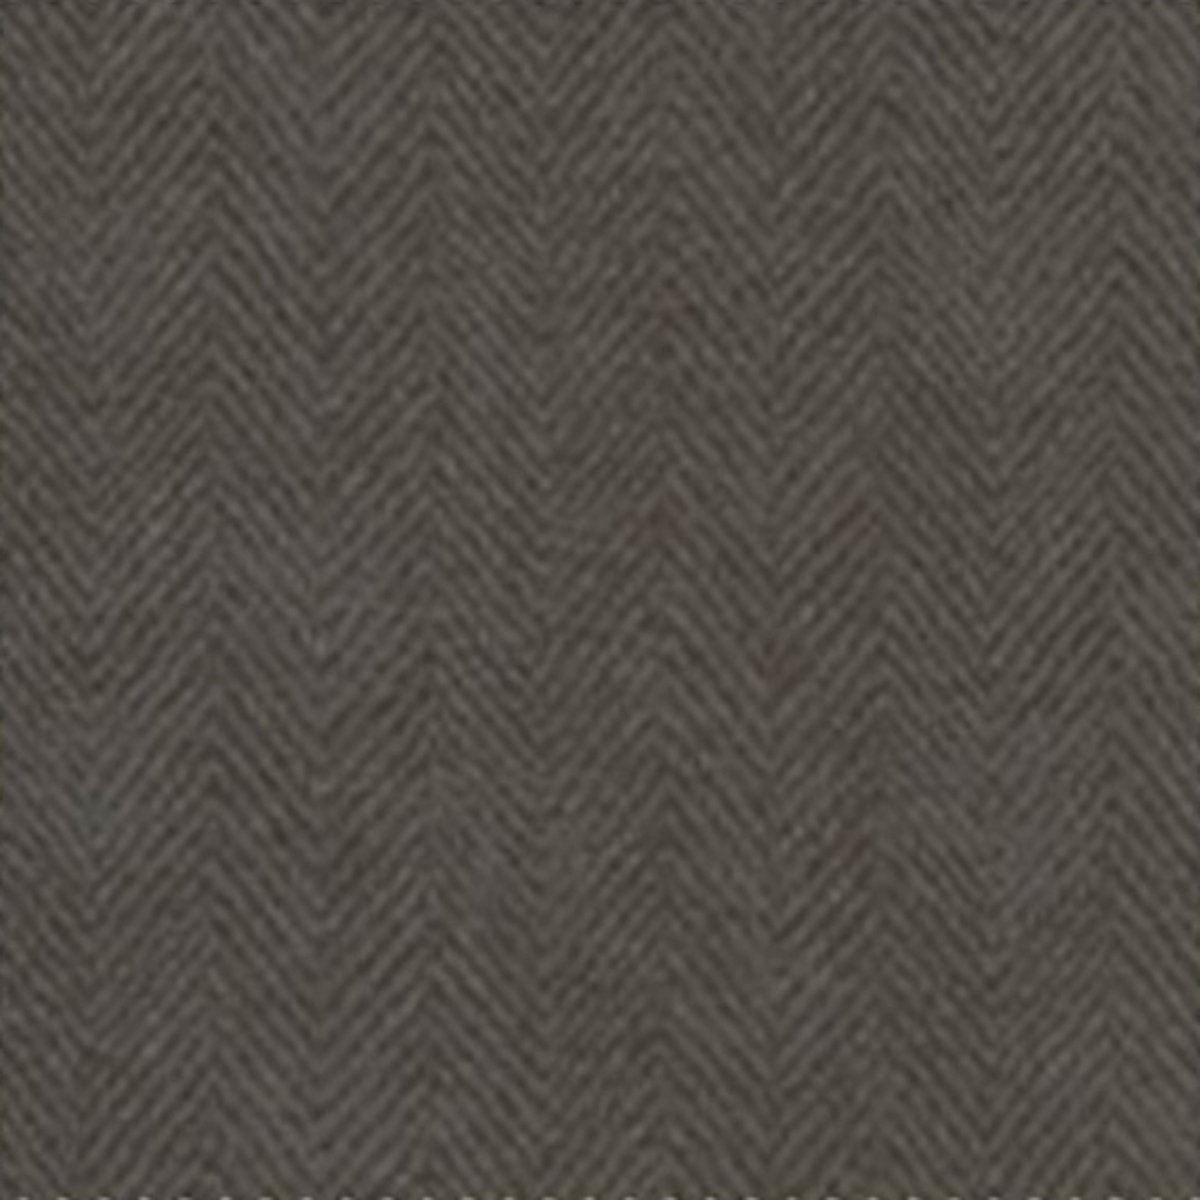 Woolies Flannel - MASF1841-K3